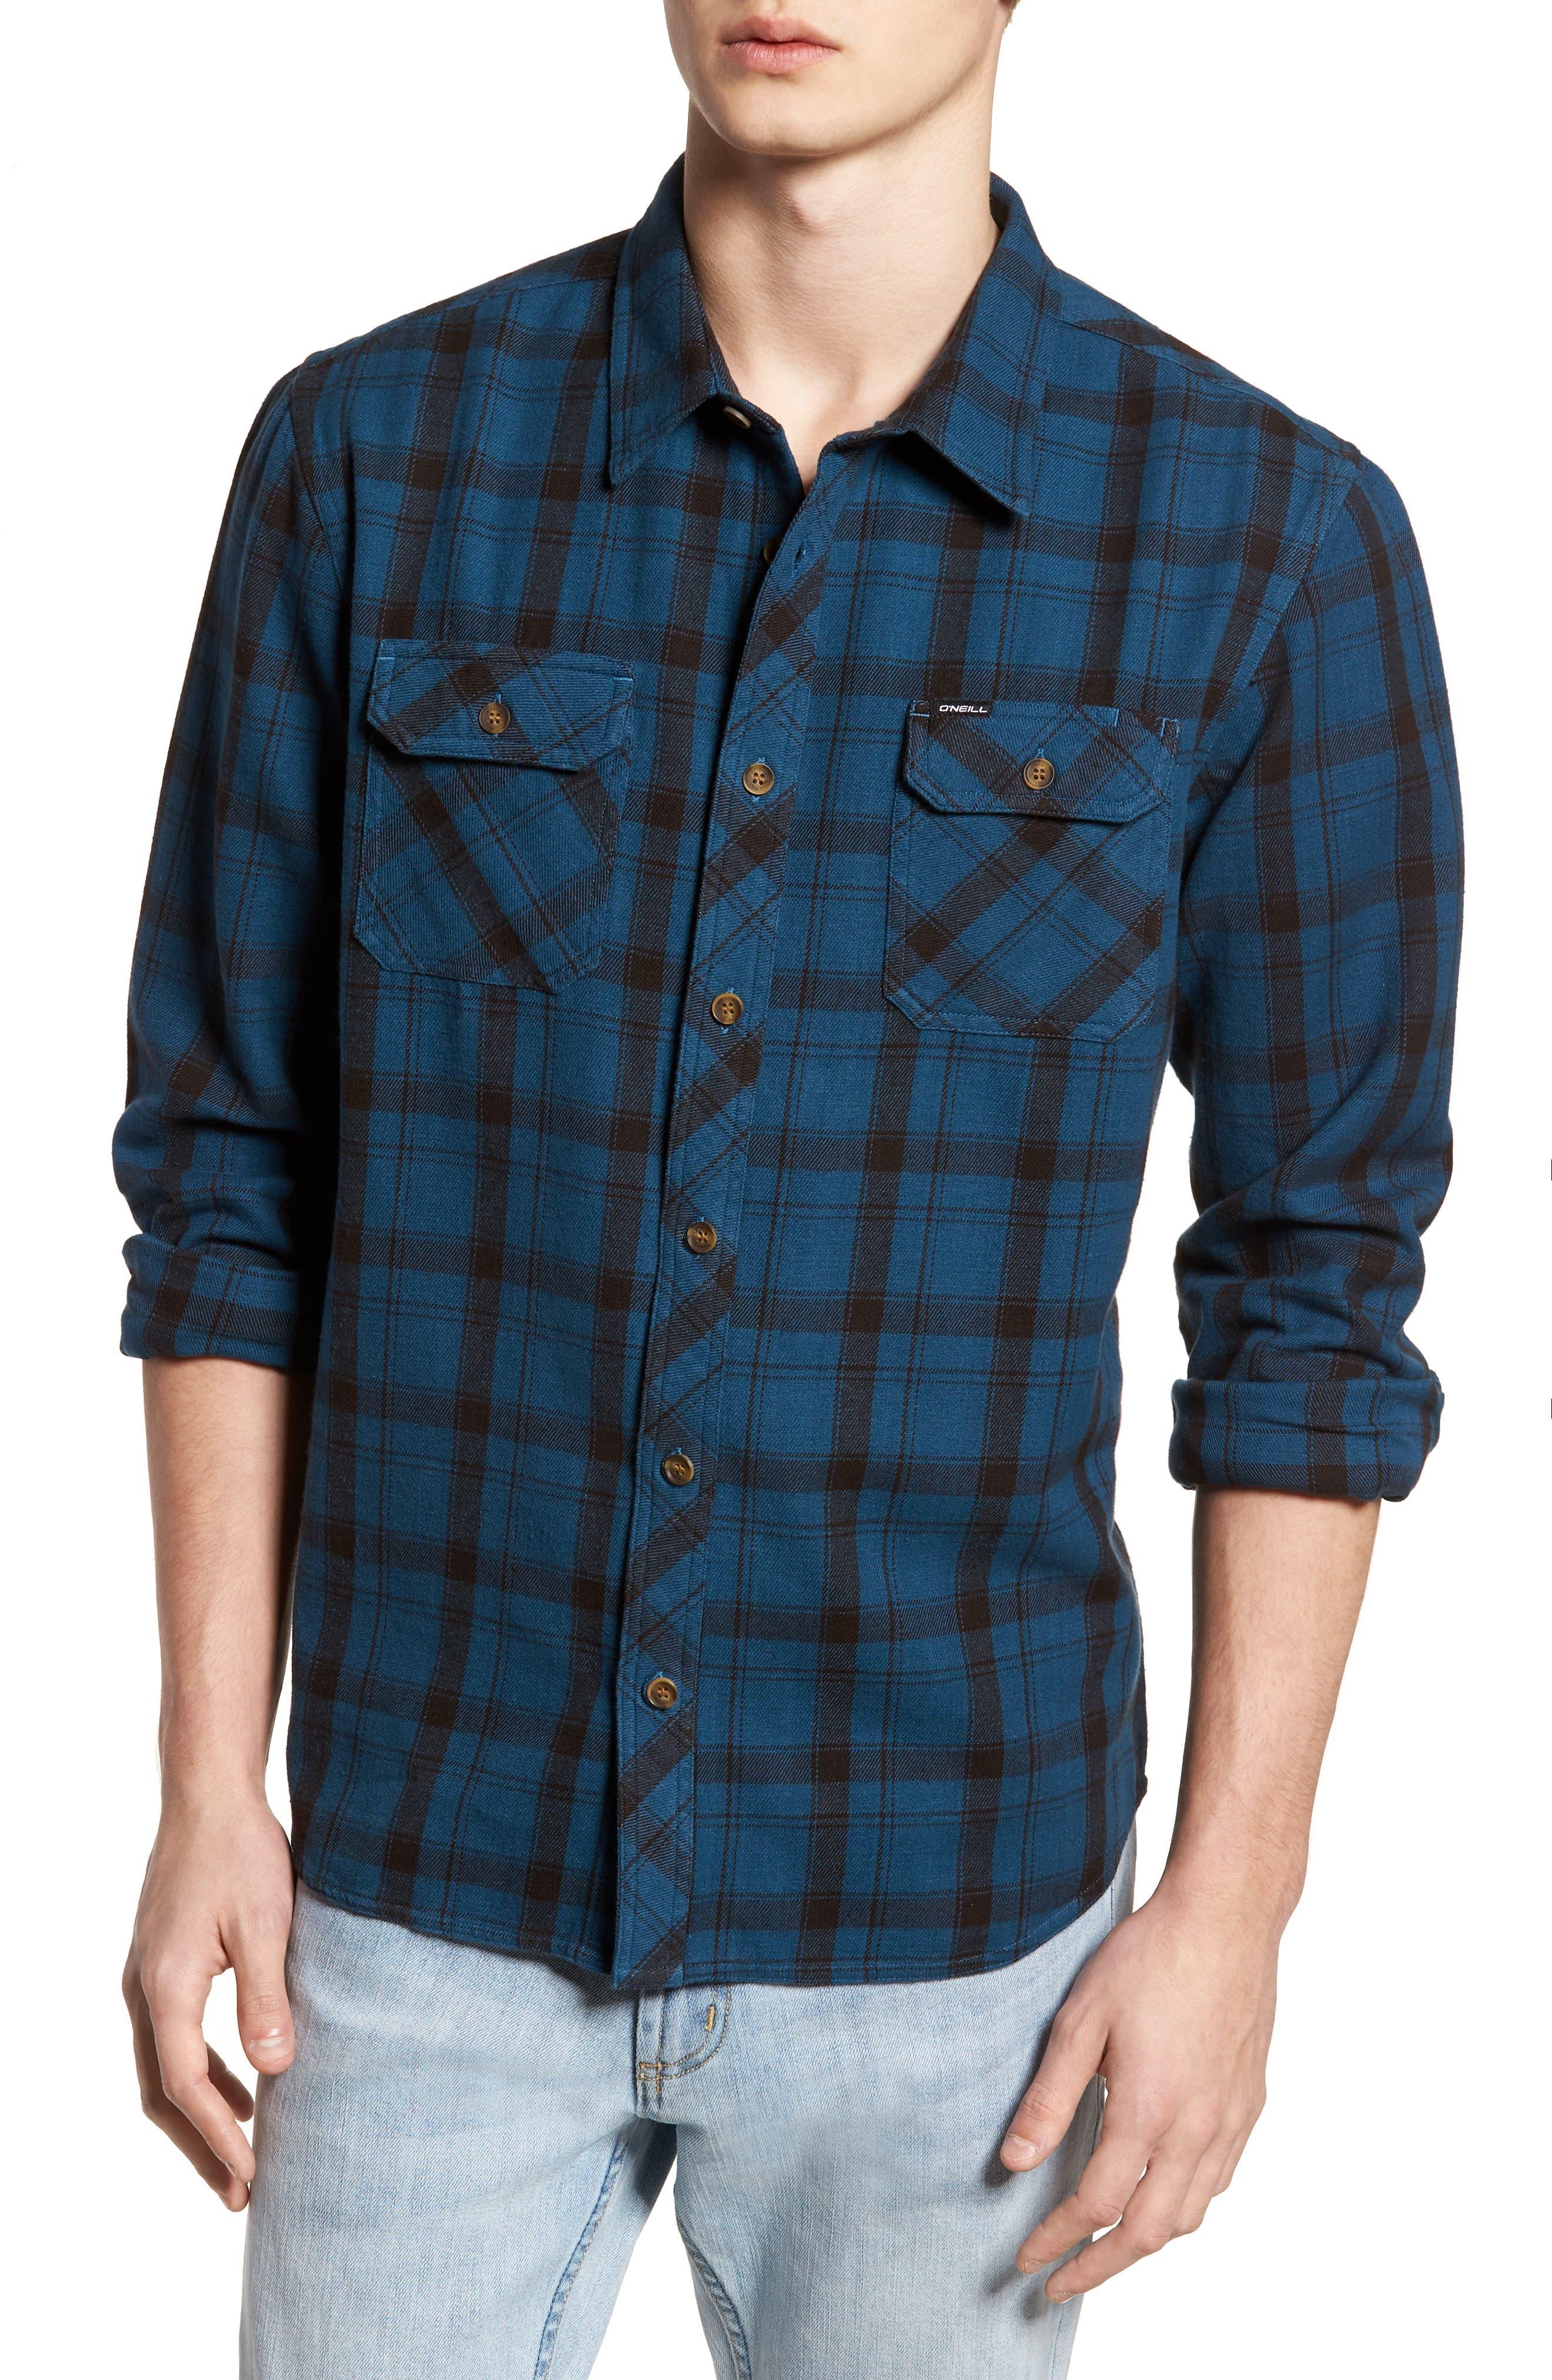 O'Neill Carpenter Flannel Shirt